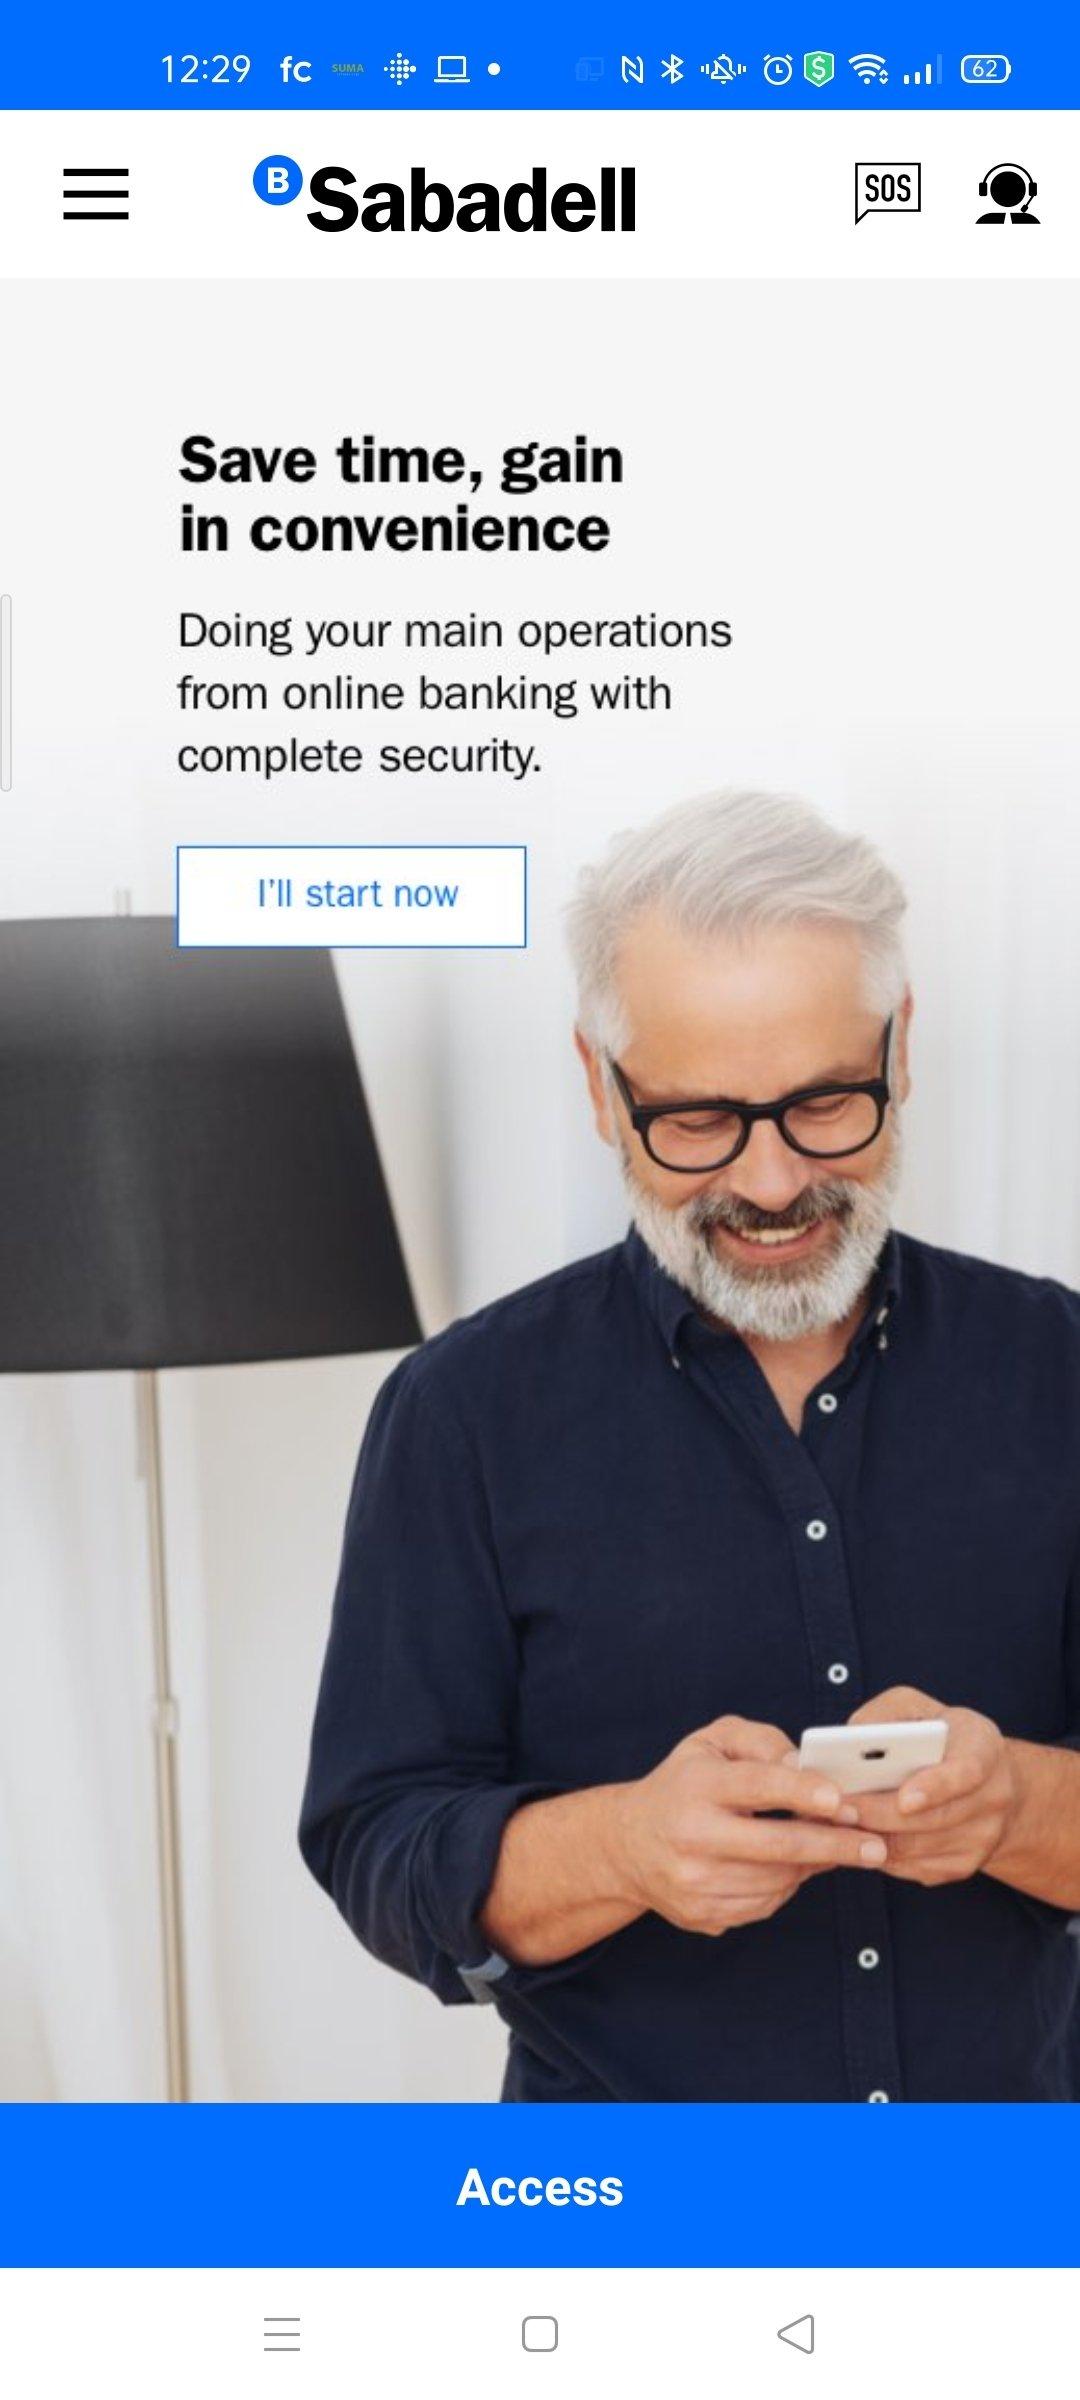 Descargar banco sabadell android gratis en espa ol - Oficinas banc sabadell ...